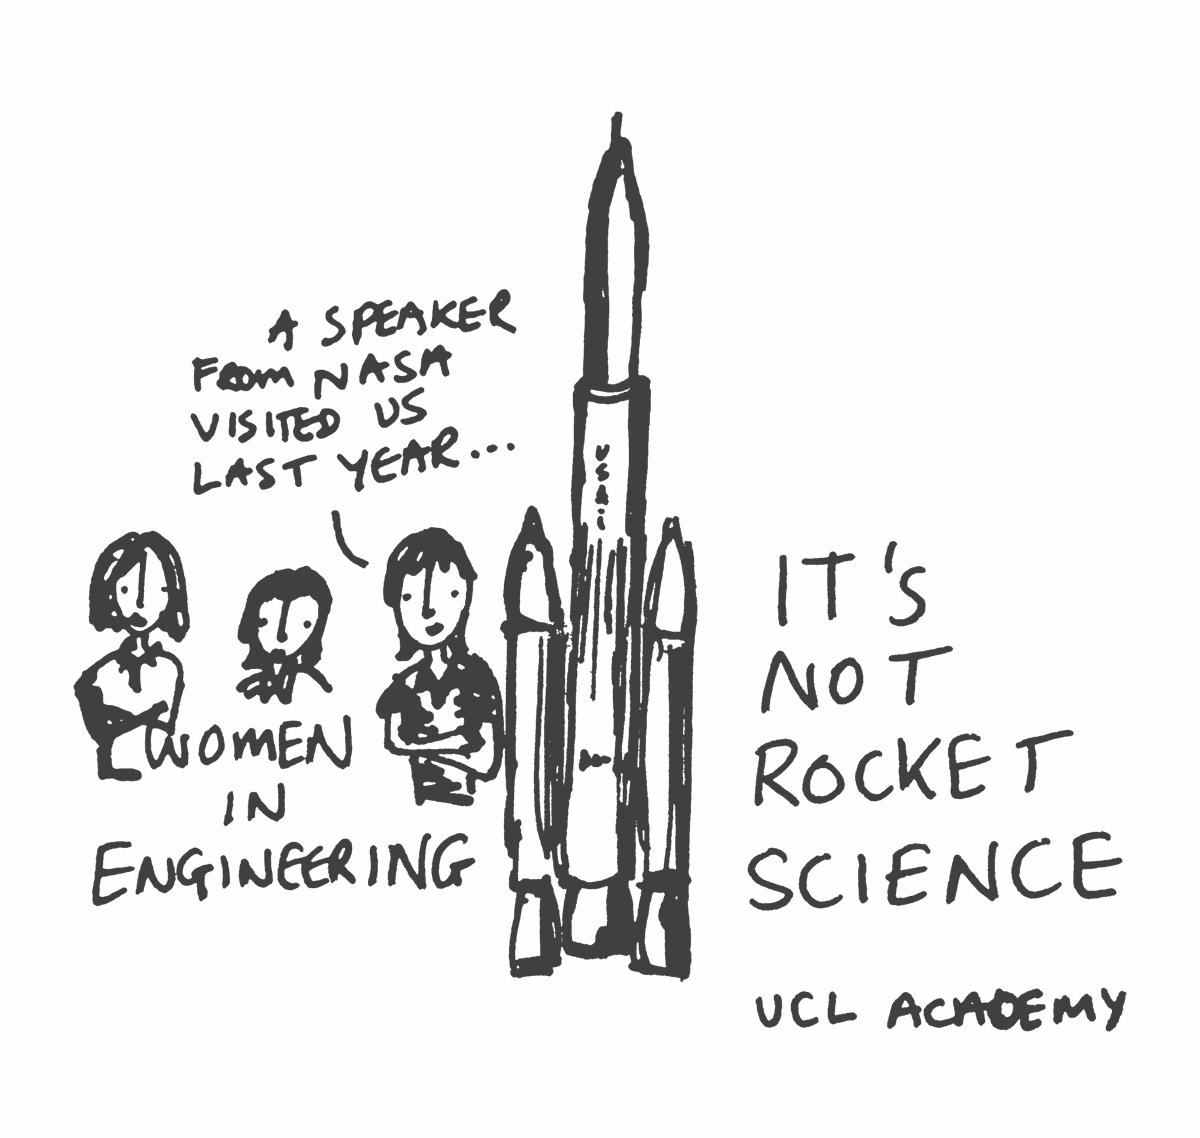 UCL Academy - Women in engineering